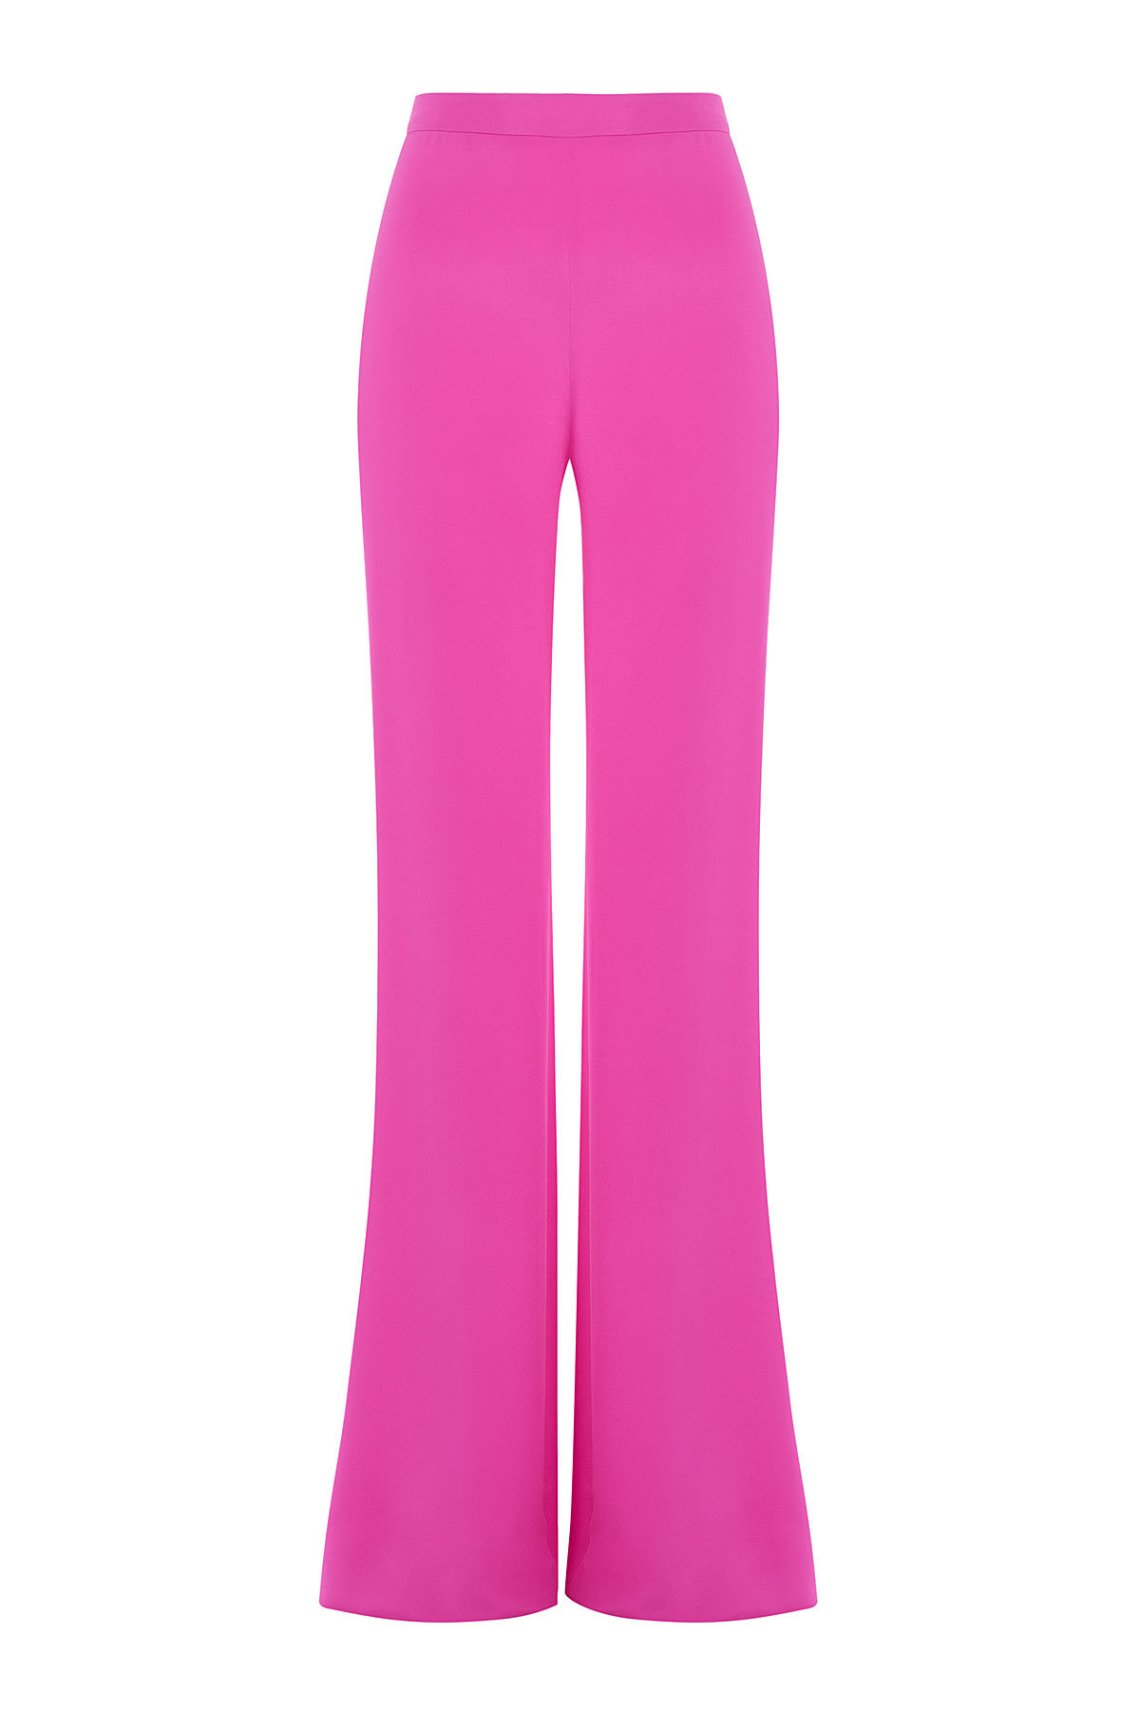 Emilio Pucci Silk Pants.jpg